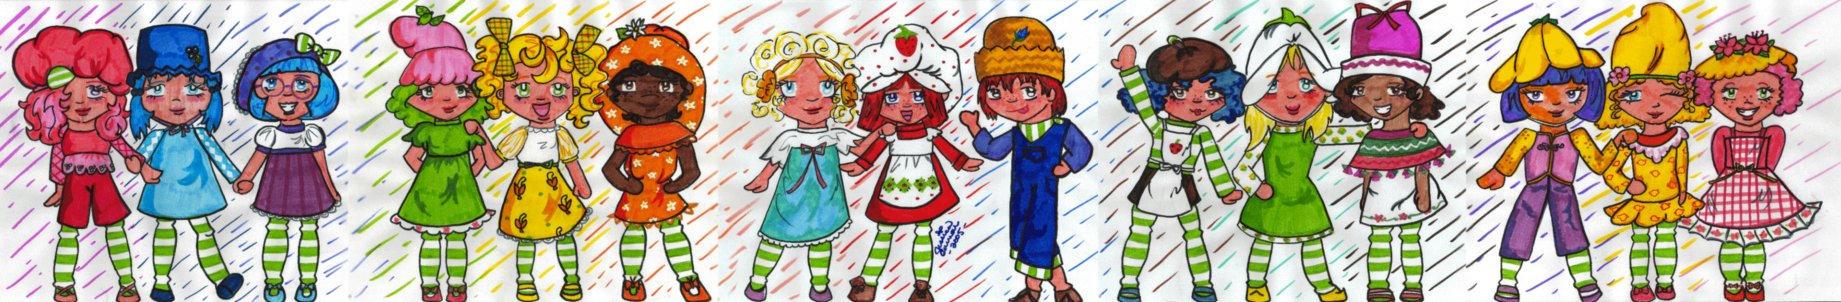 Strawberry Shortcake Gang by endisforever818